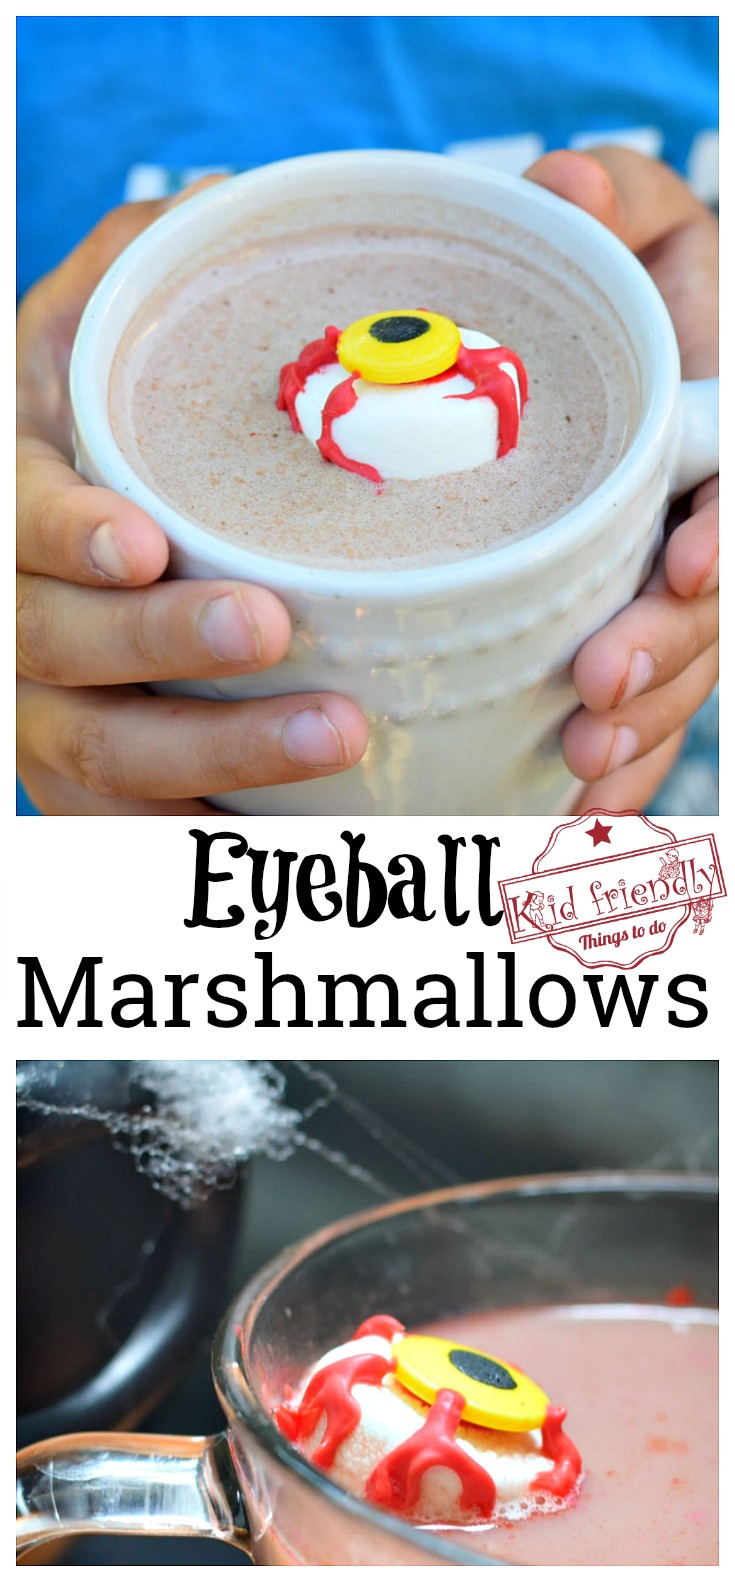 Spooky Marshmallow Eyeball for a Kid's Halloween Fun Hot Chocolate Treat - easy to make and so fun. Fall drink idea. www.kidfriendlythingstodo.com